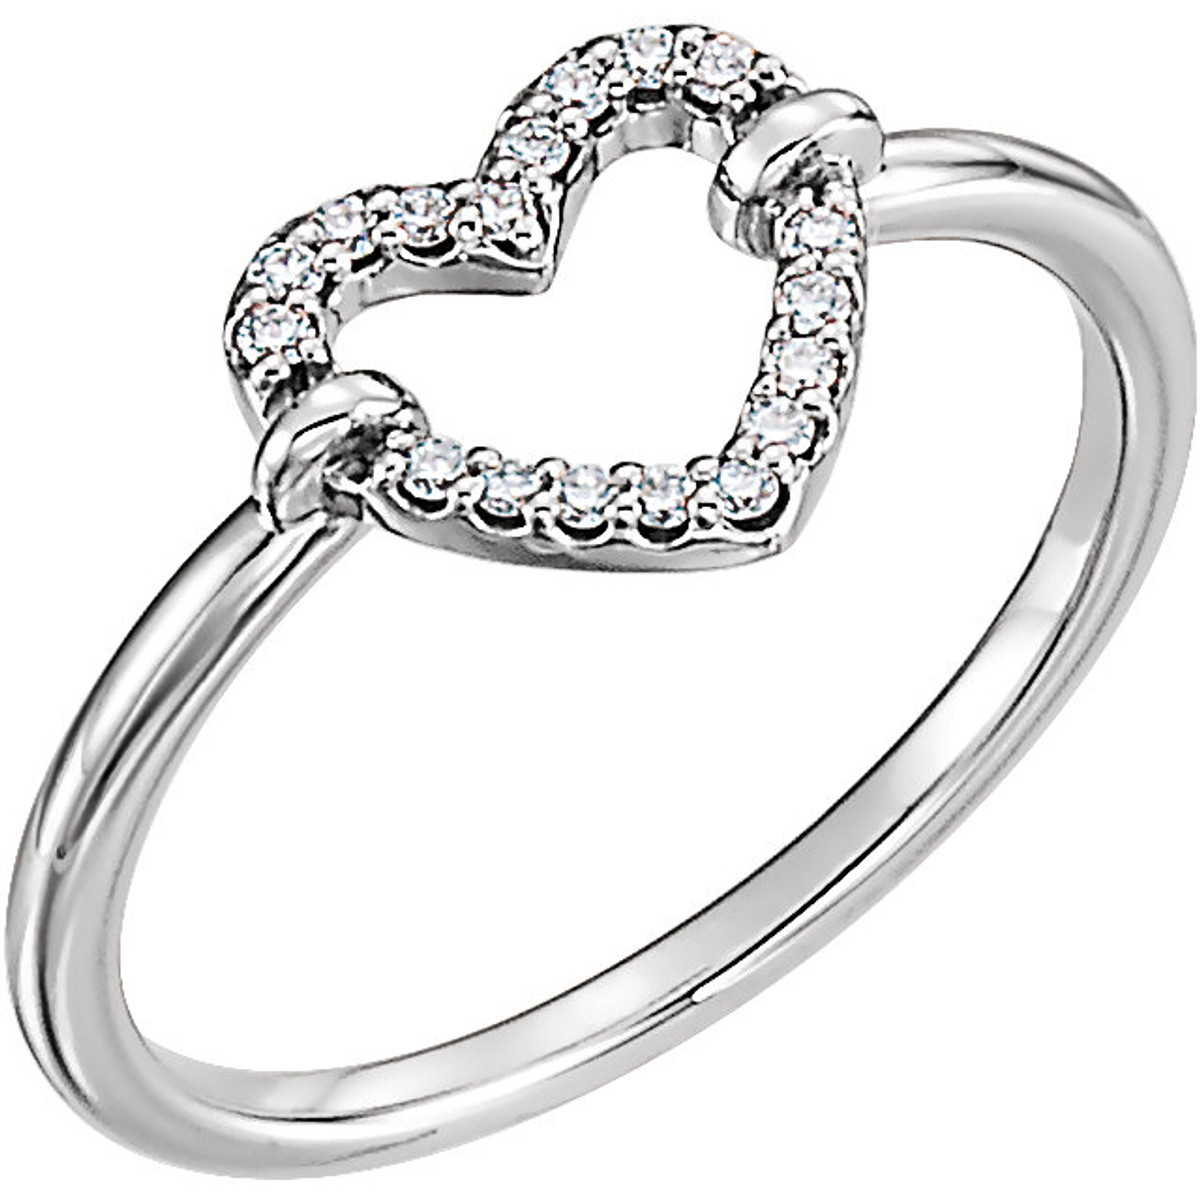 White Gold Petite Diamond Heart Ring